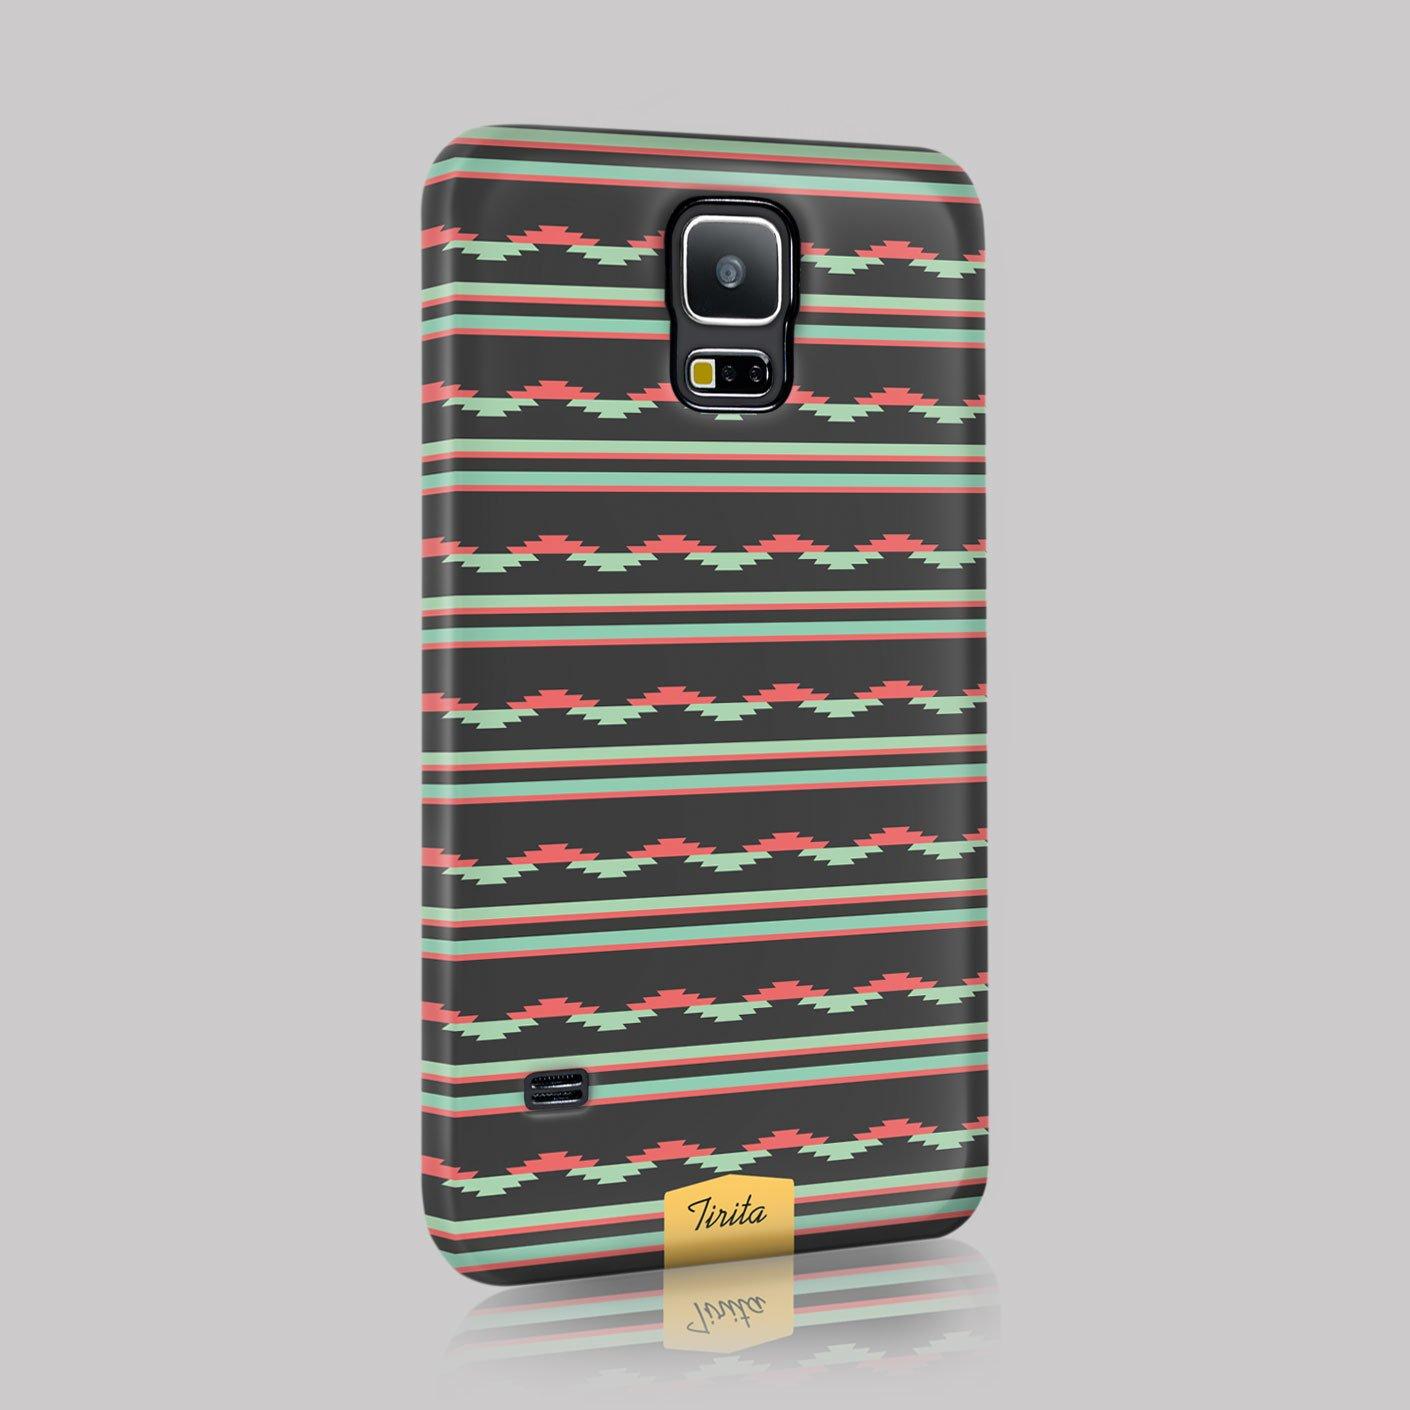 tirita samsung galaxy s5 mini phone case